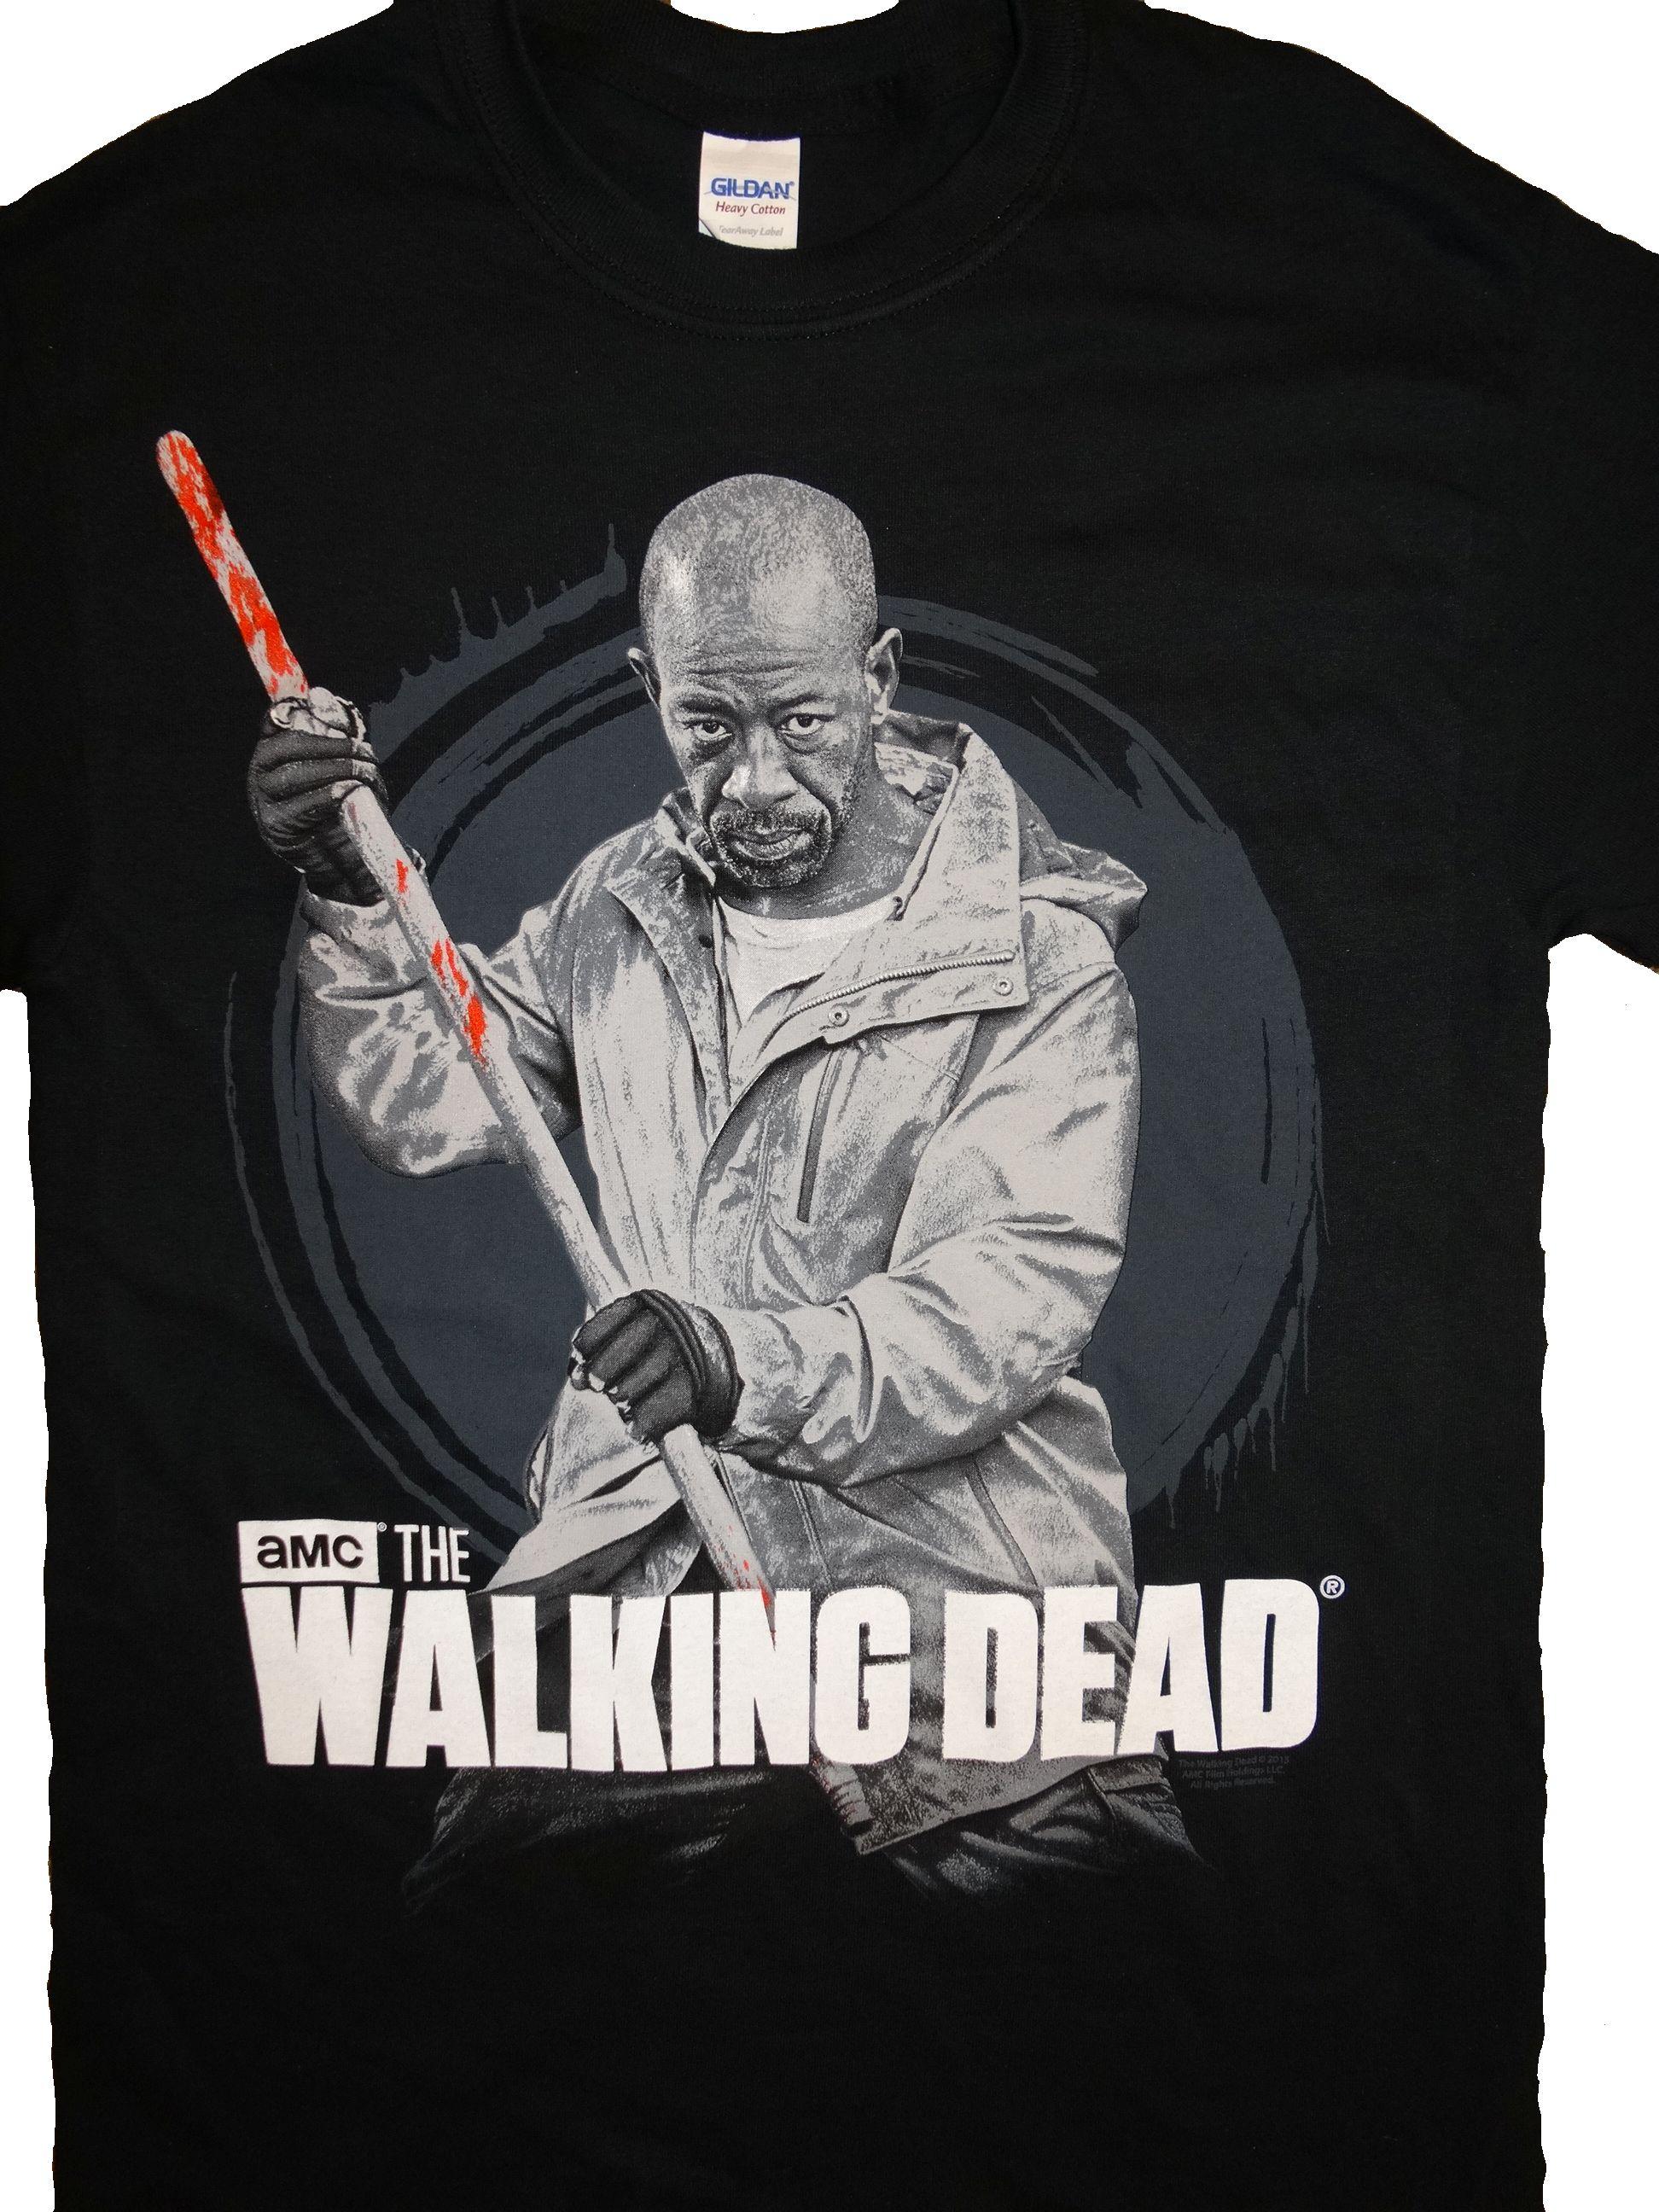 The Walking Dead Bloody Staff T-Shirt